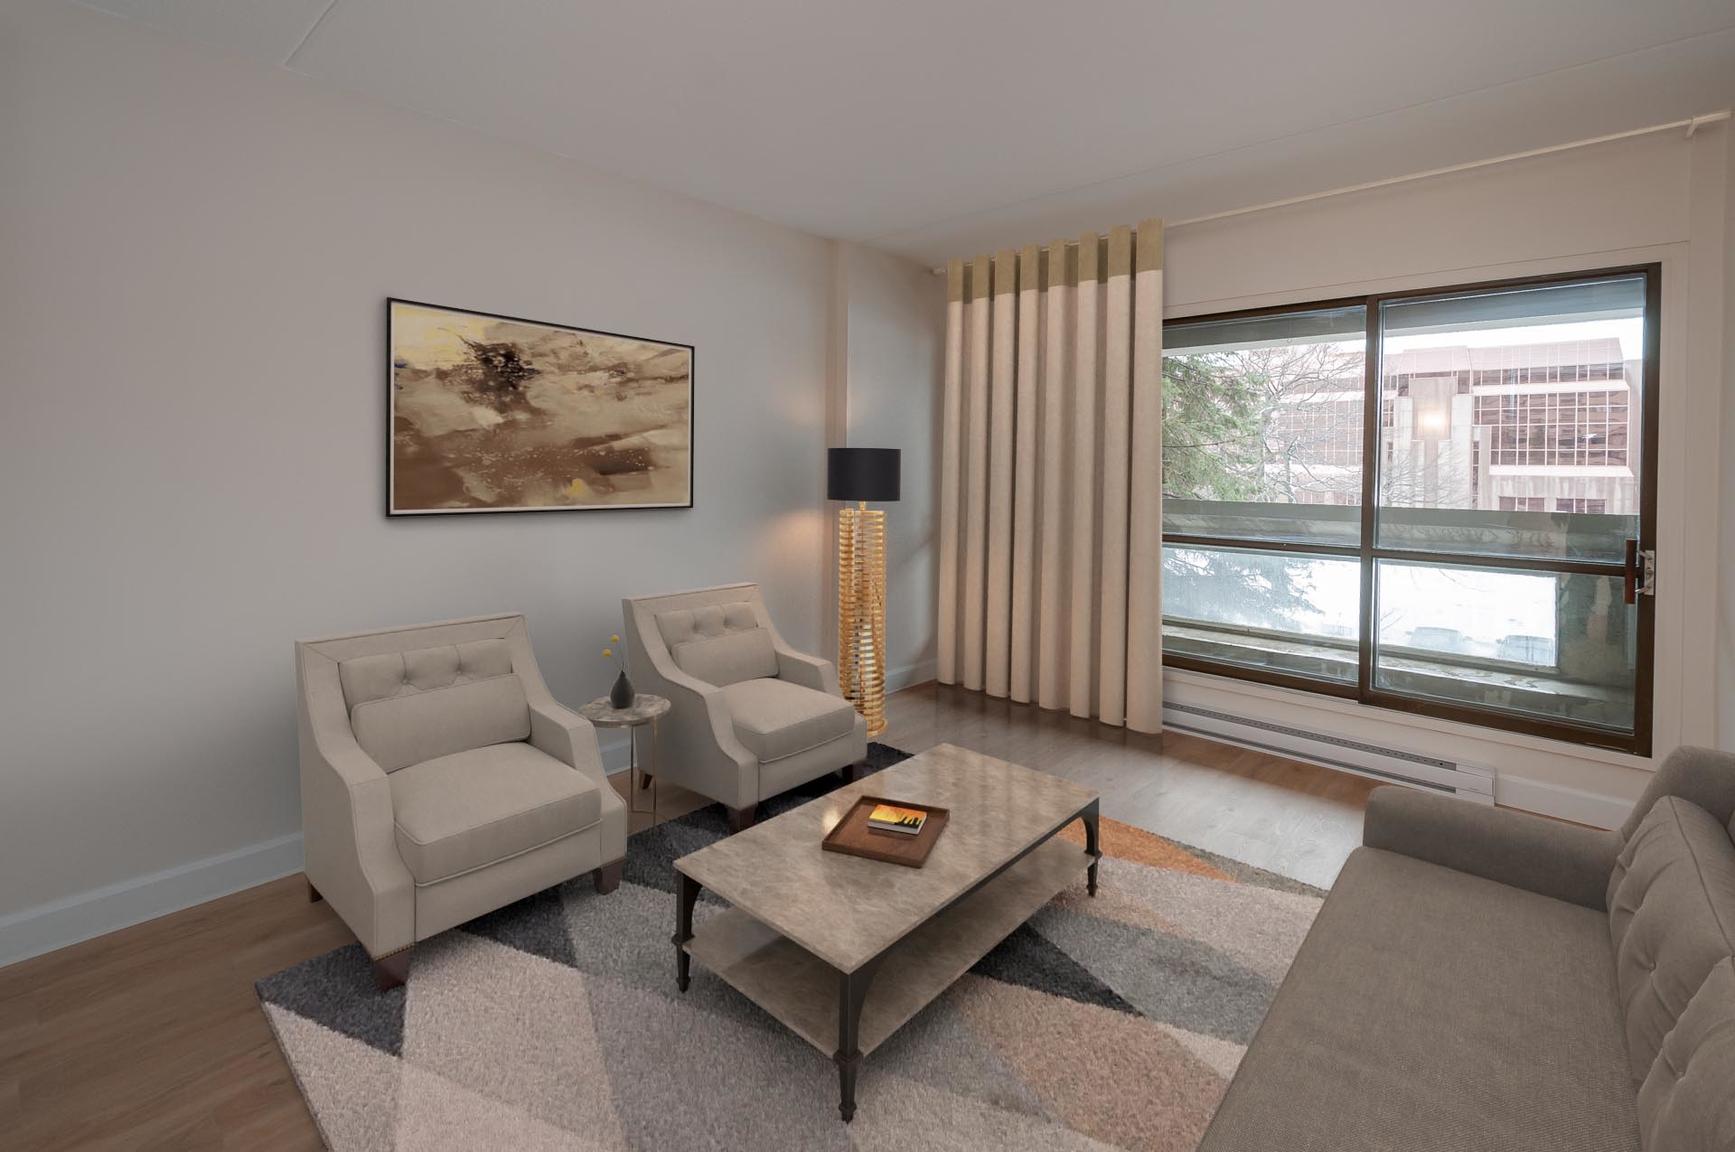 2 bedroom Apartments for rent in Quebec City at Les Jardins de Merici - Photo 16 - RentersPages – L407783